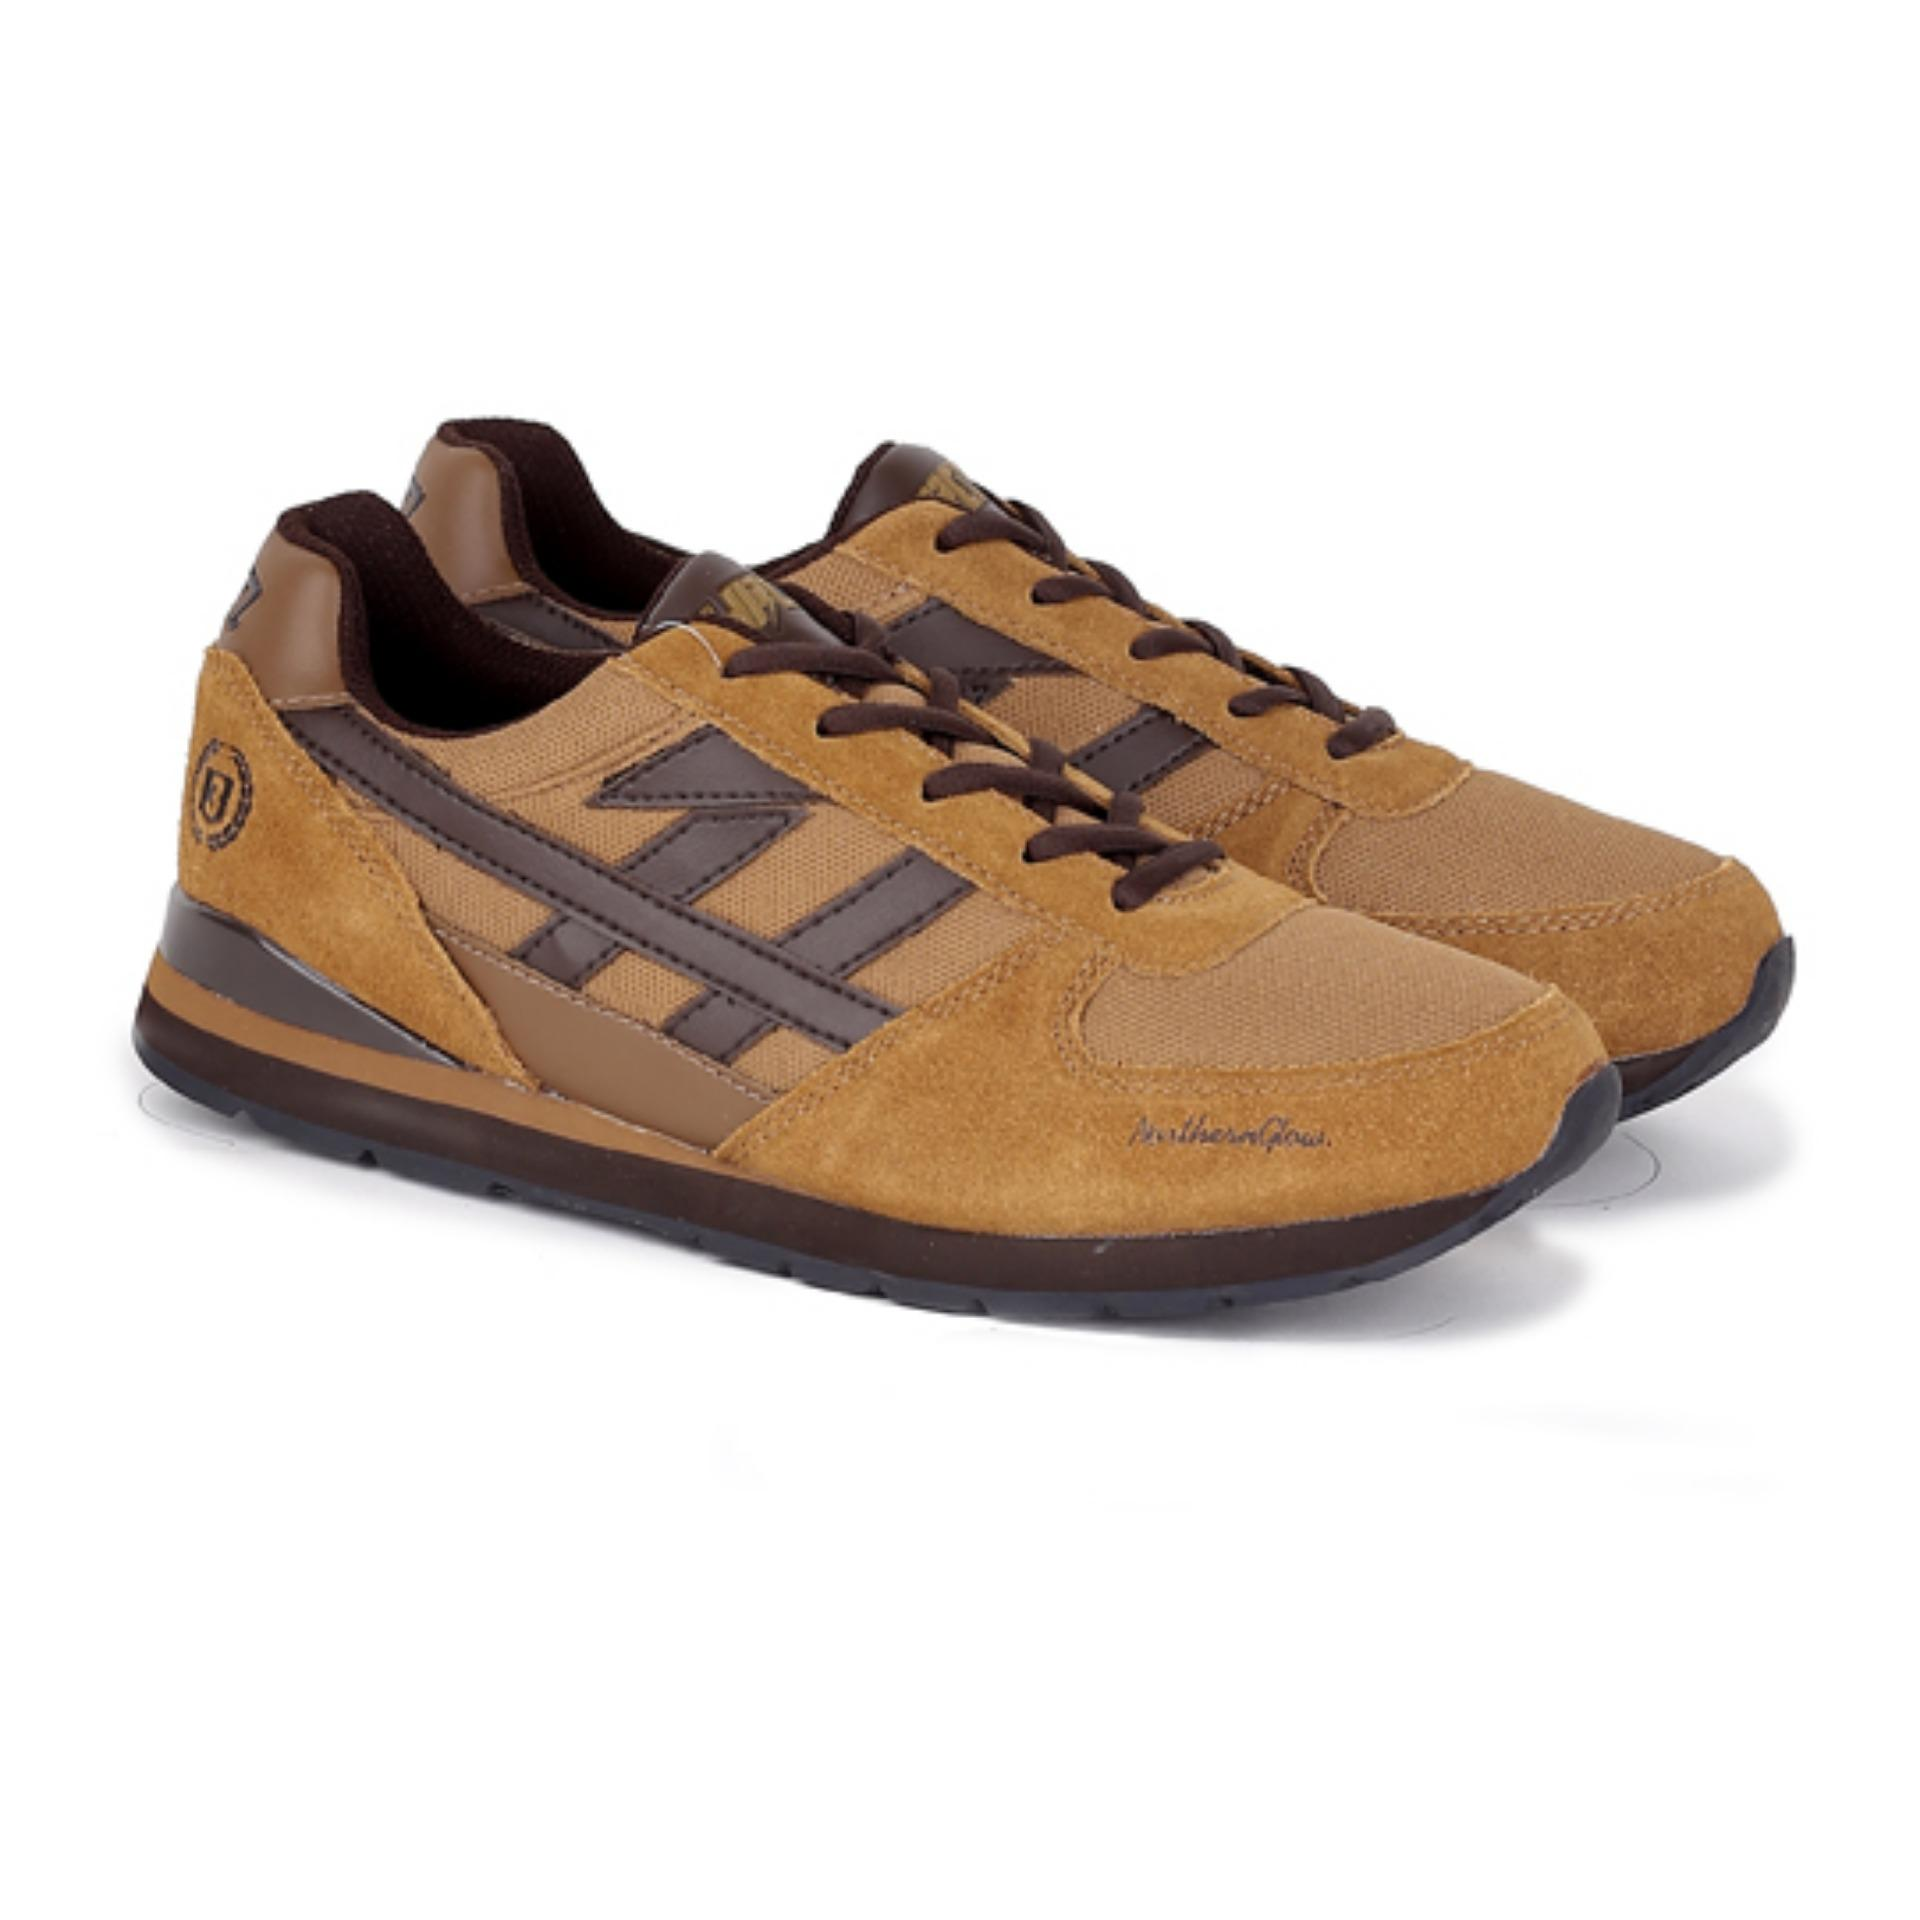 Hrcn Hpm 5144 Sepatu Northern Glow Sneaker Pria Suede Leather H 5259 Liberty Flash Sale Limited